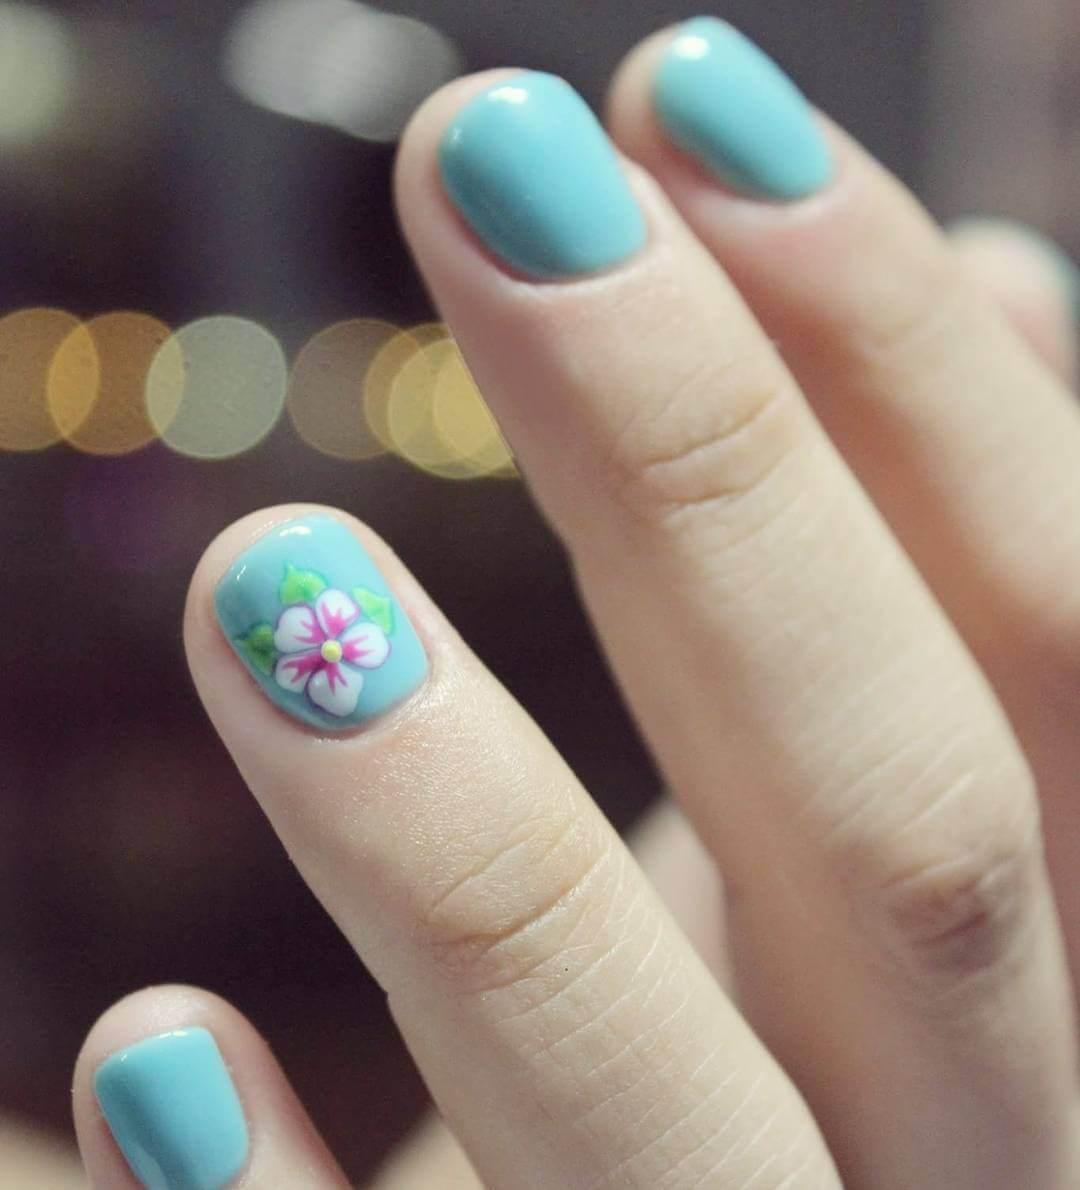 ongles courts avec fleurs